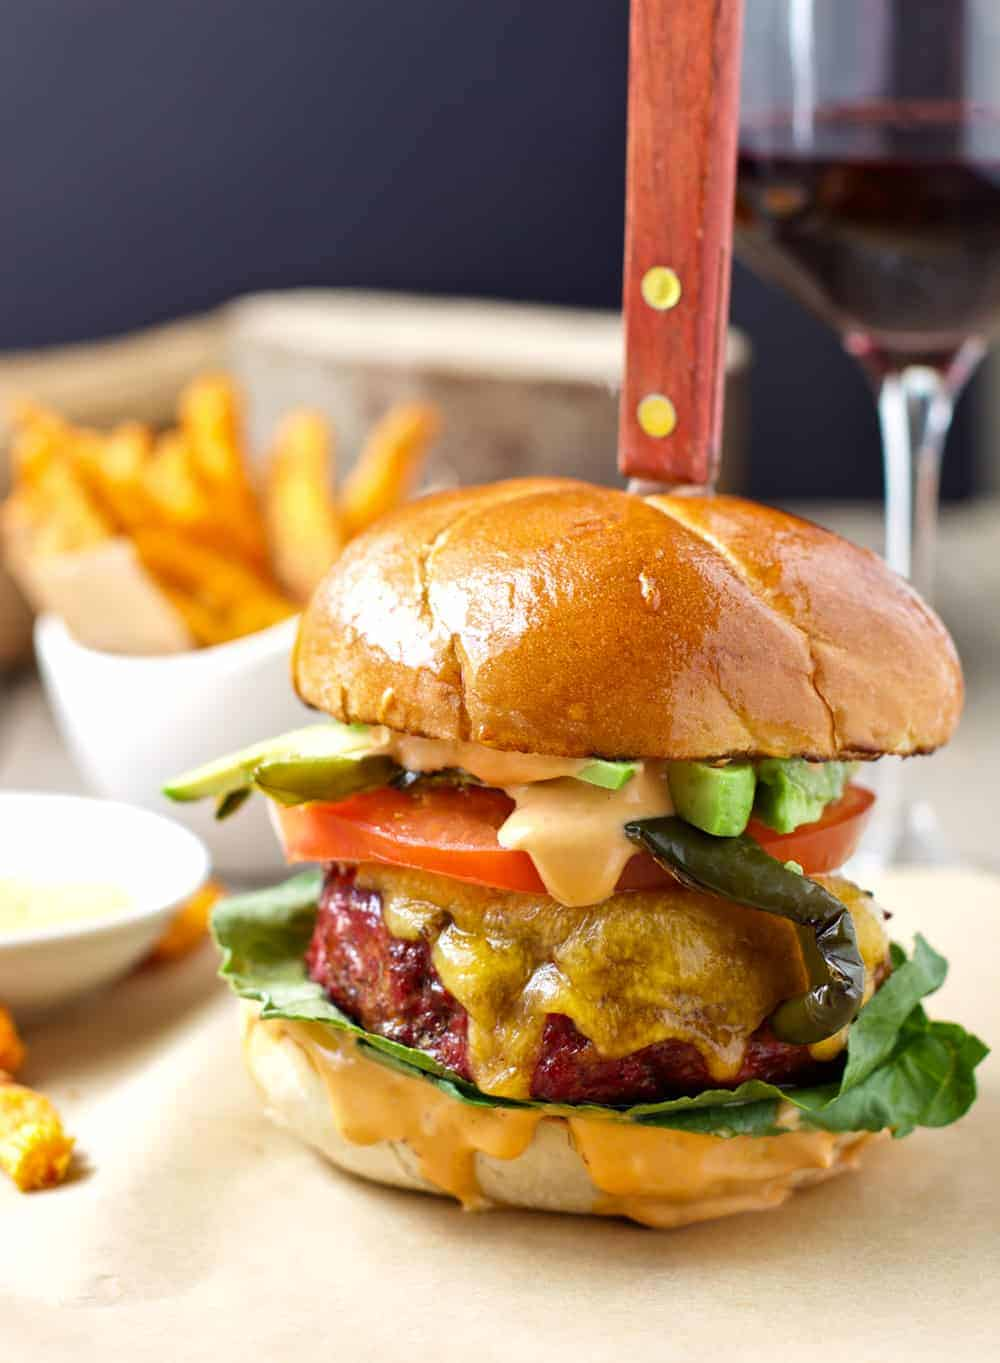 Sofa King Juicy Burger Facebook Functionalities Net